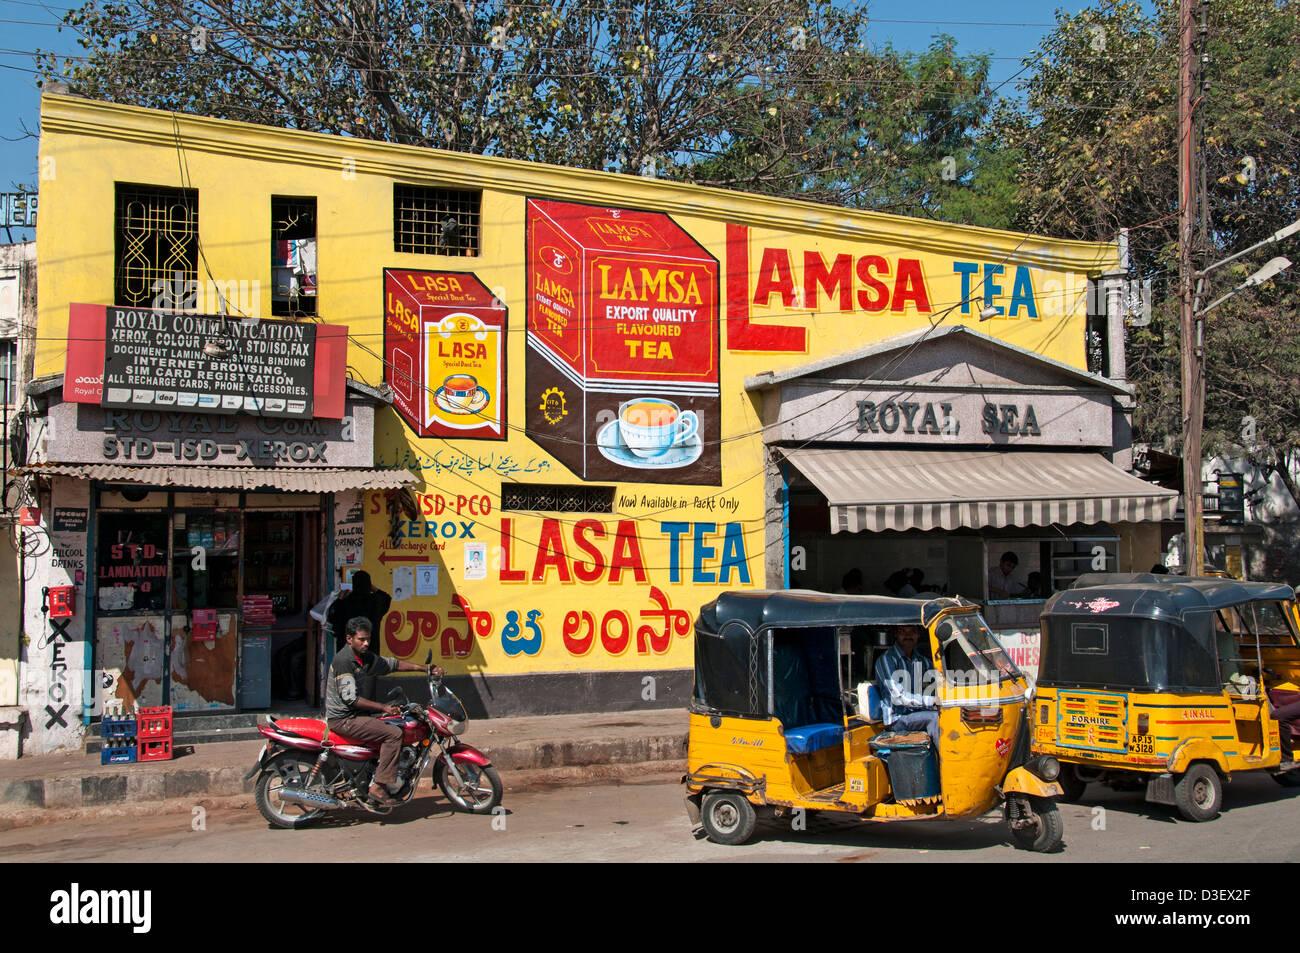 Lamsa Tea Shop di Hyderabad, India Andhra Pradesh Immagini Stock